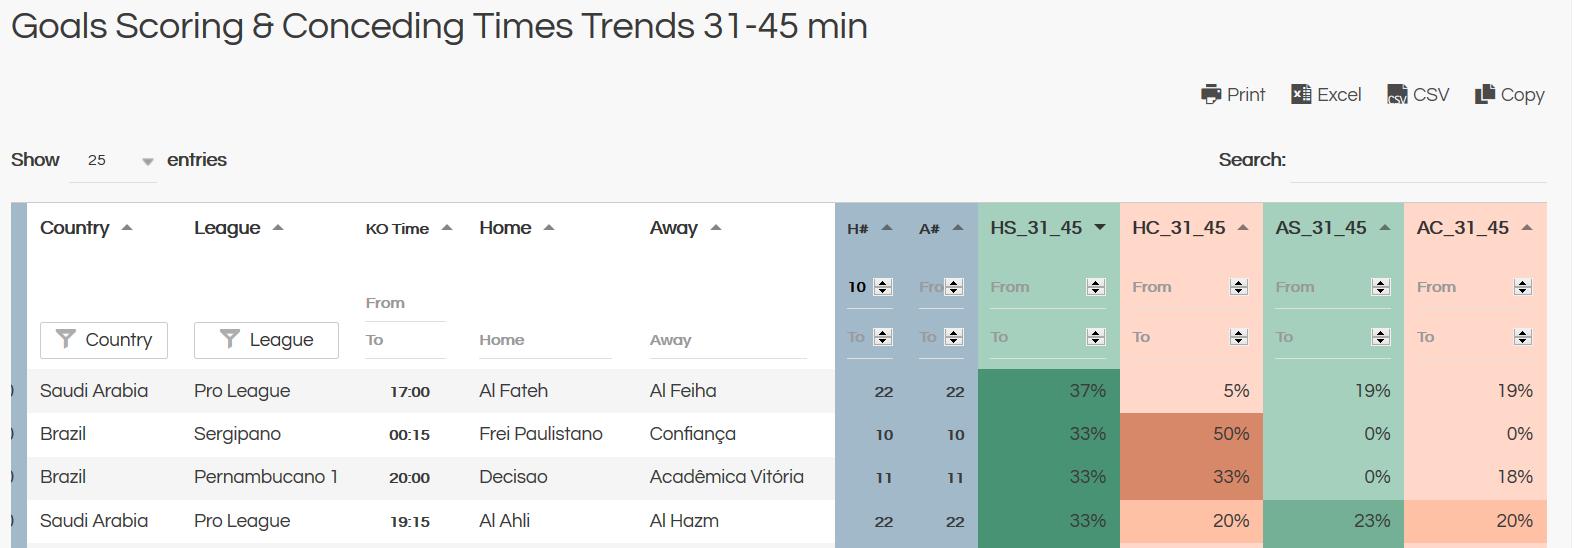 first half goals 31-45 minutes goals trends